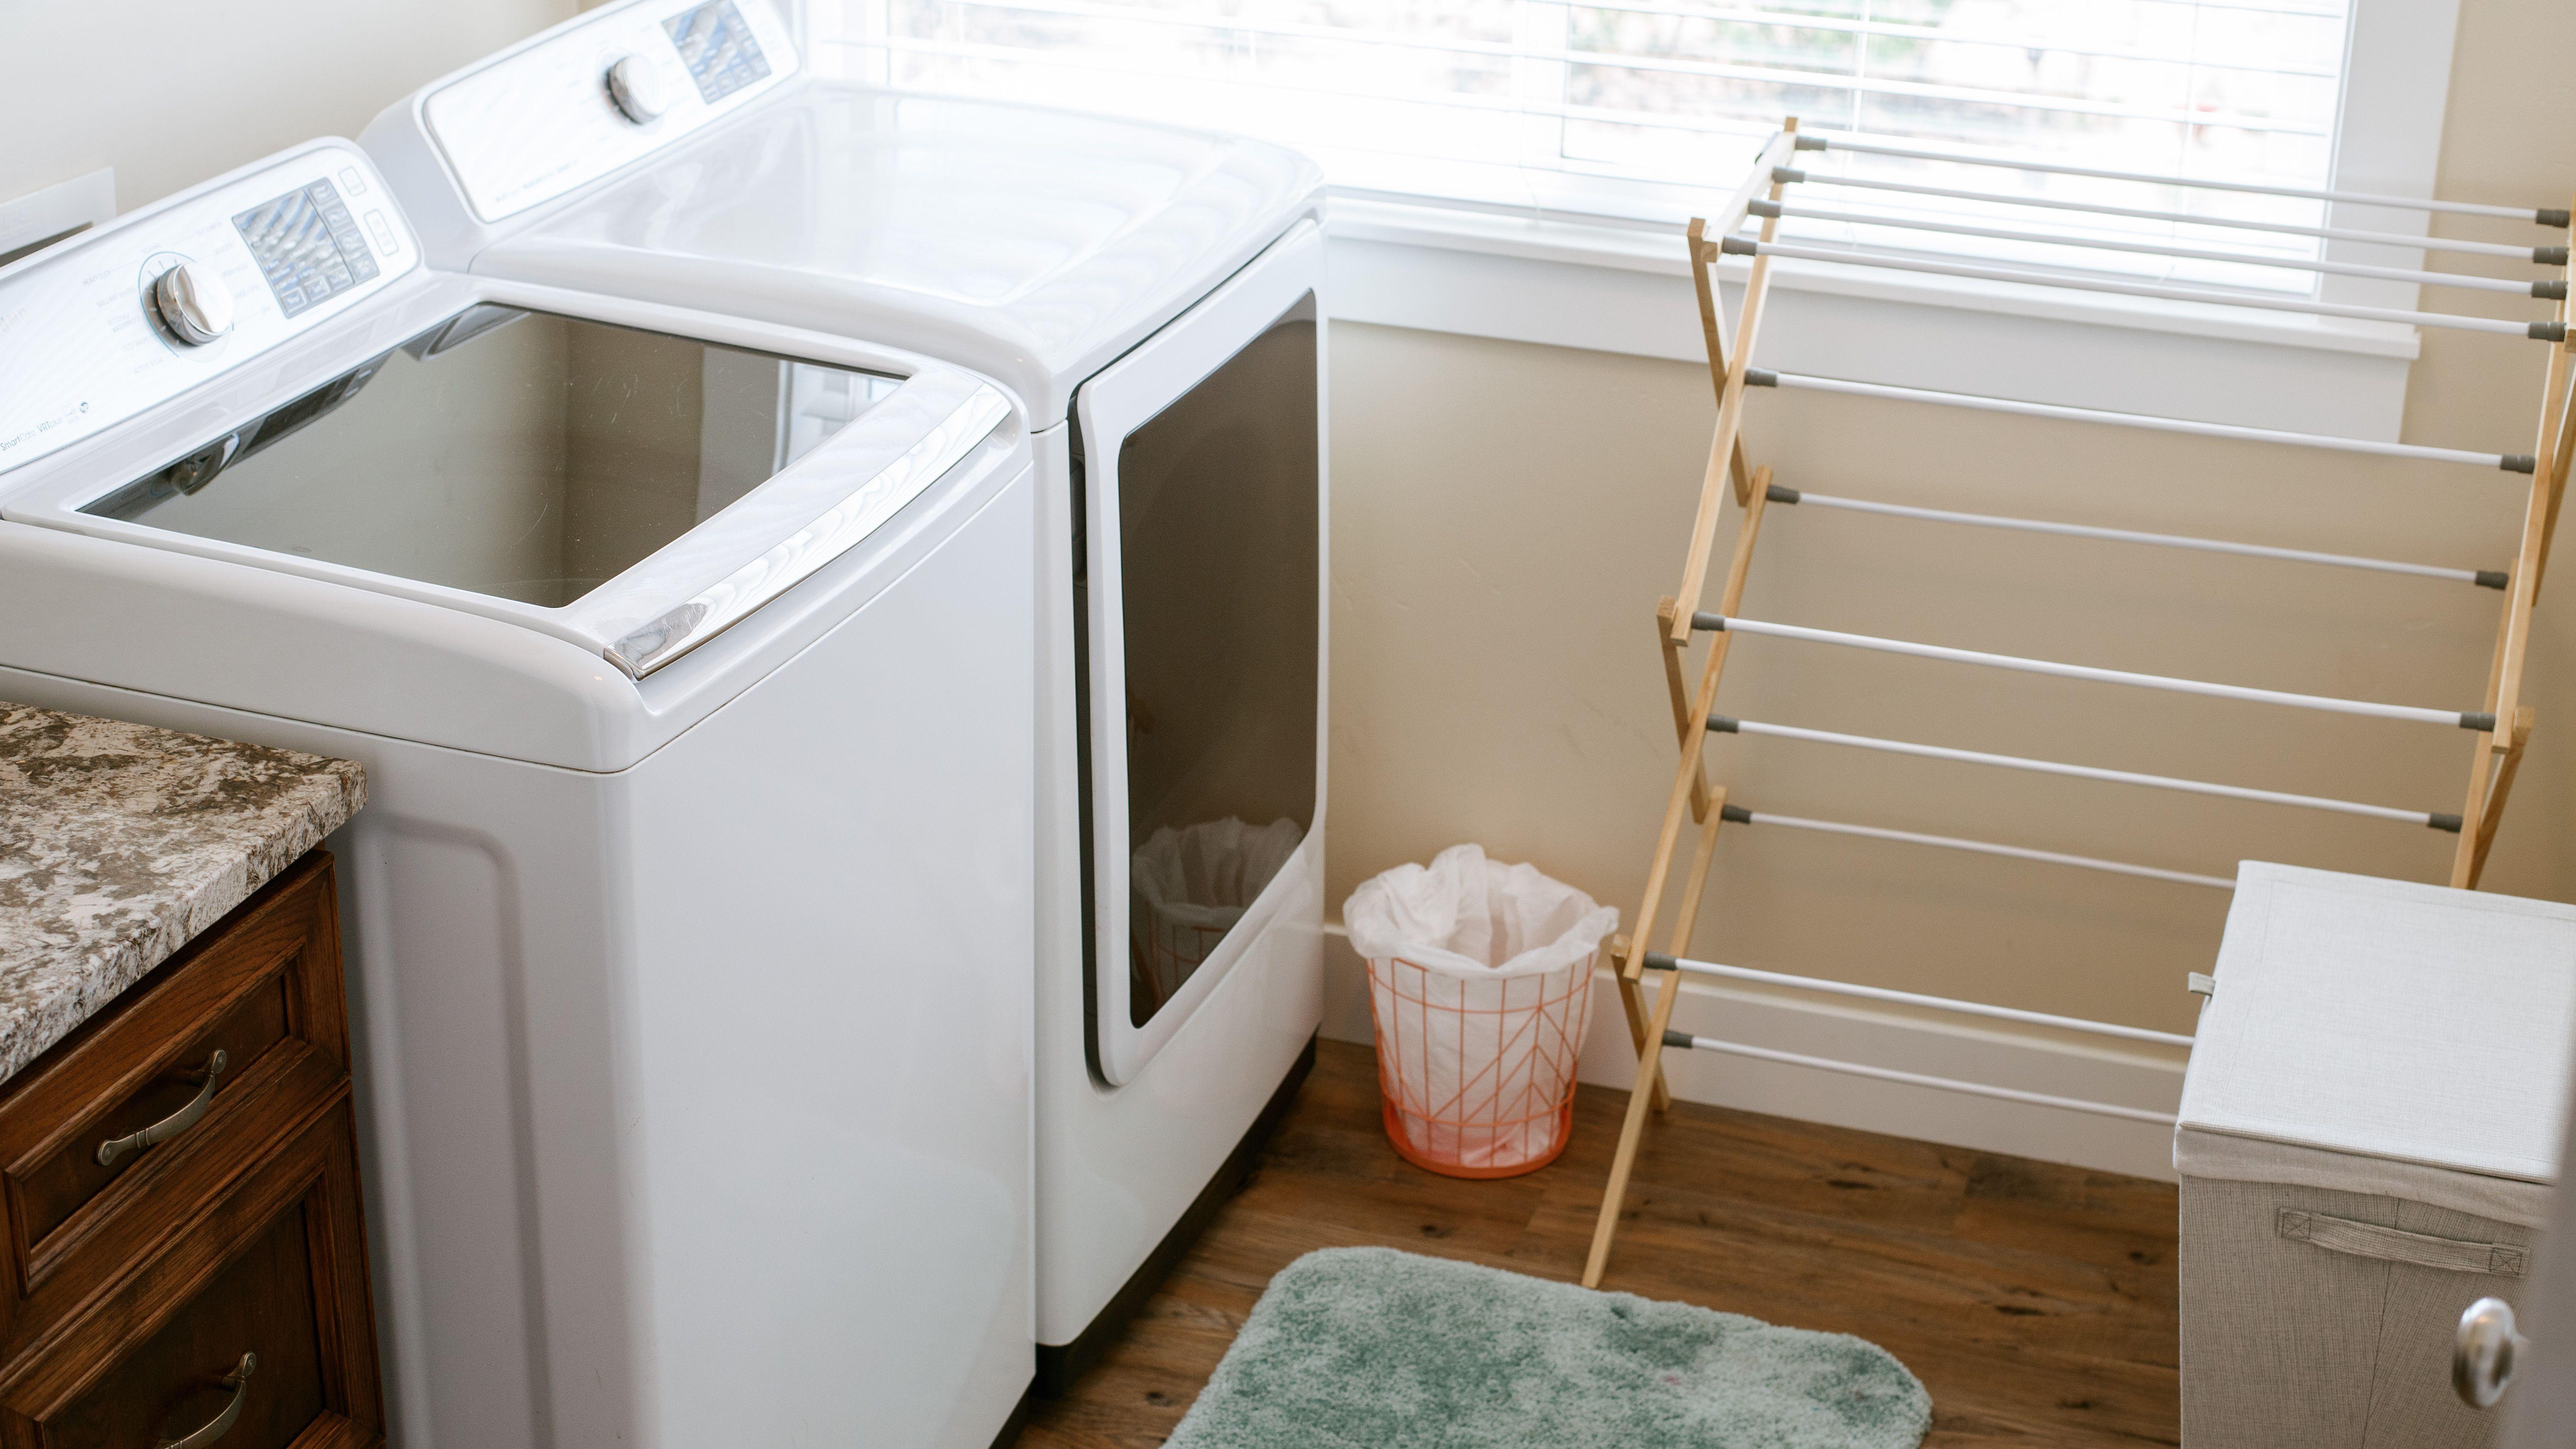 20 Essential Laundry Room Tools